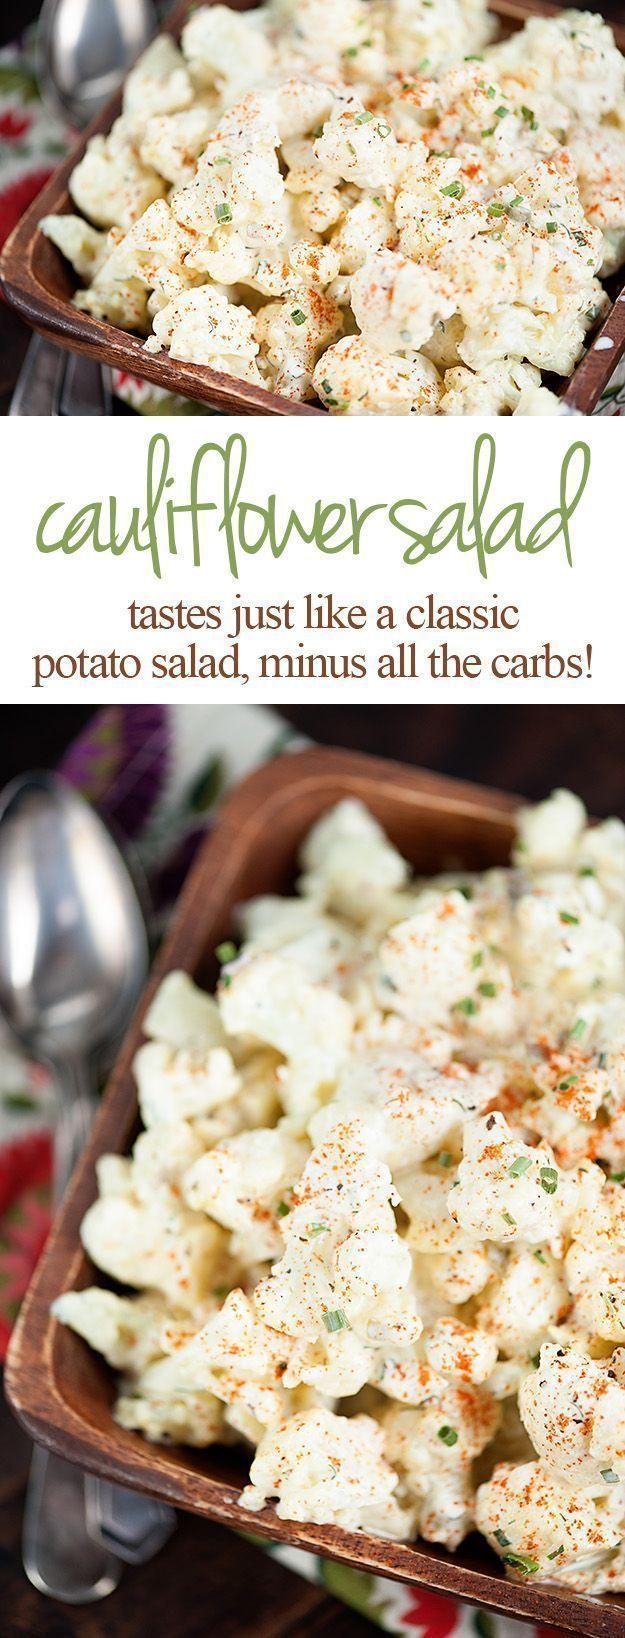 Cauliflower Potato Salad {Low Carb, Keto Friendly, Vegetarian} #ketofriendlysalads